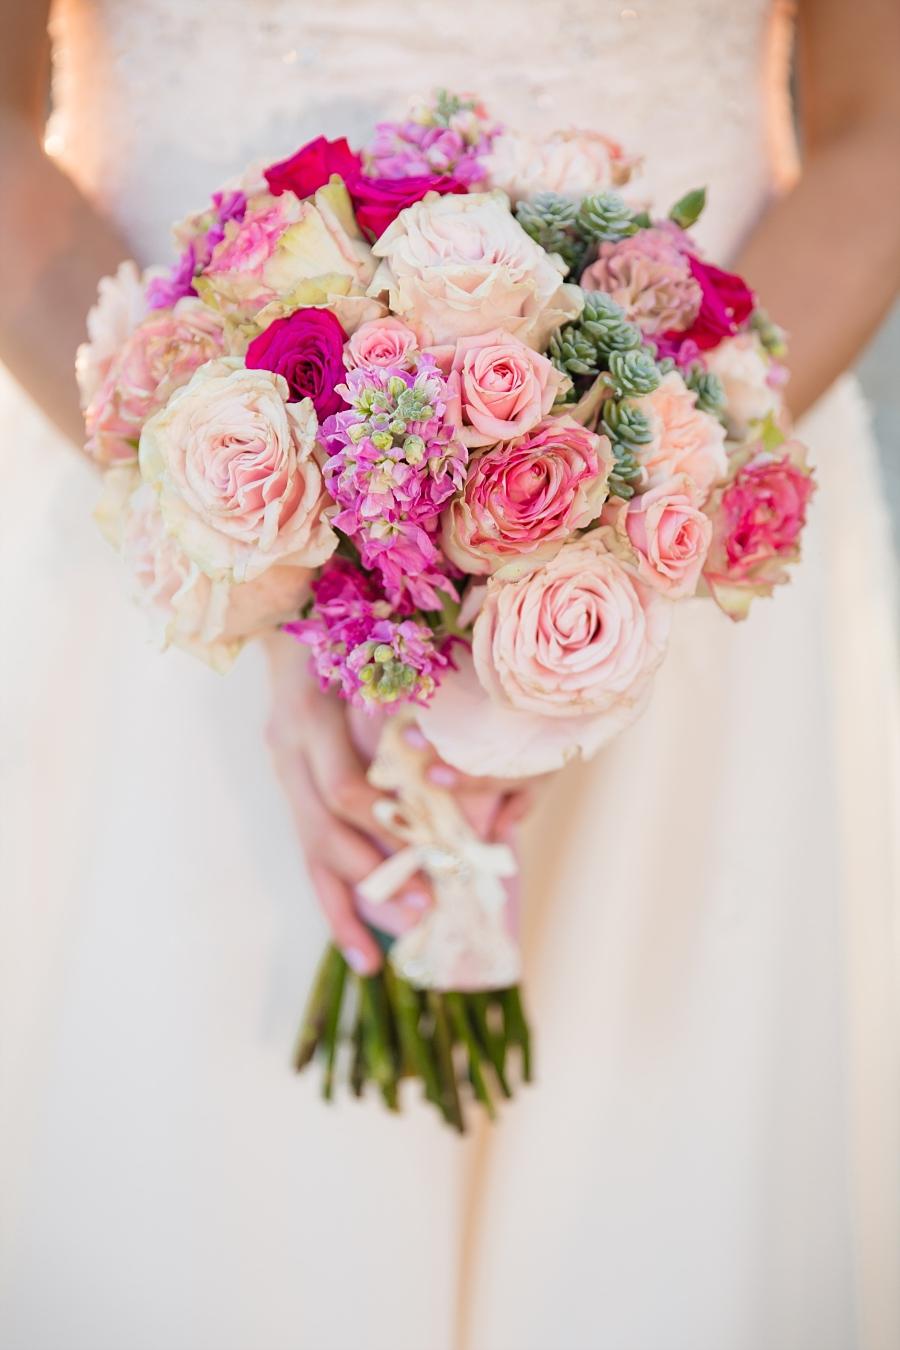 Stacy-Anderson-Photography-Balmorhea-Tomball-Wedding-Photographer_0017.jpg